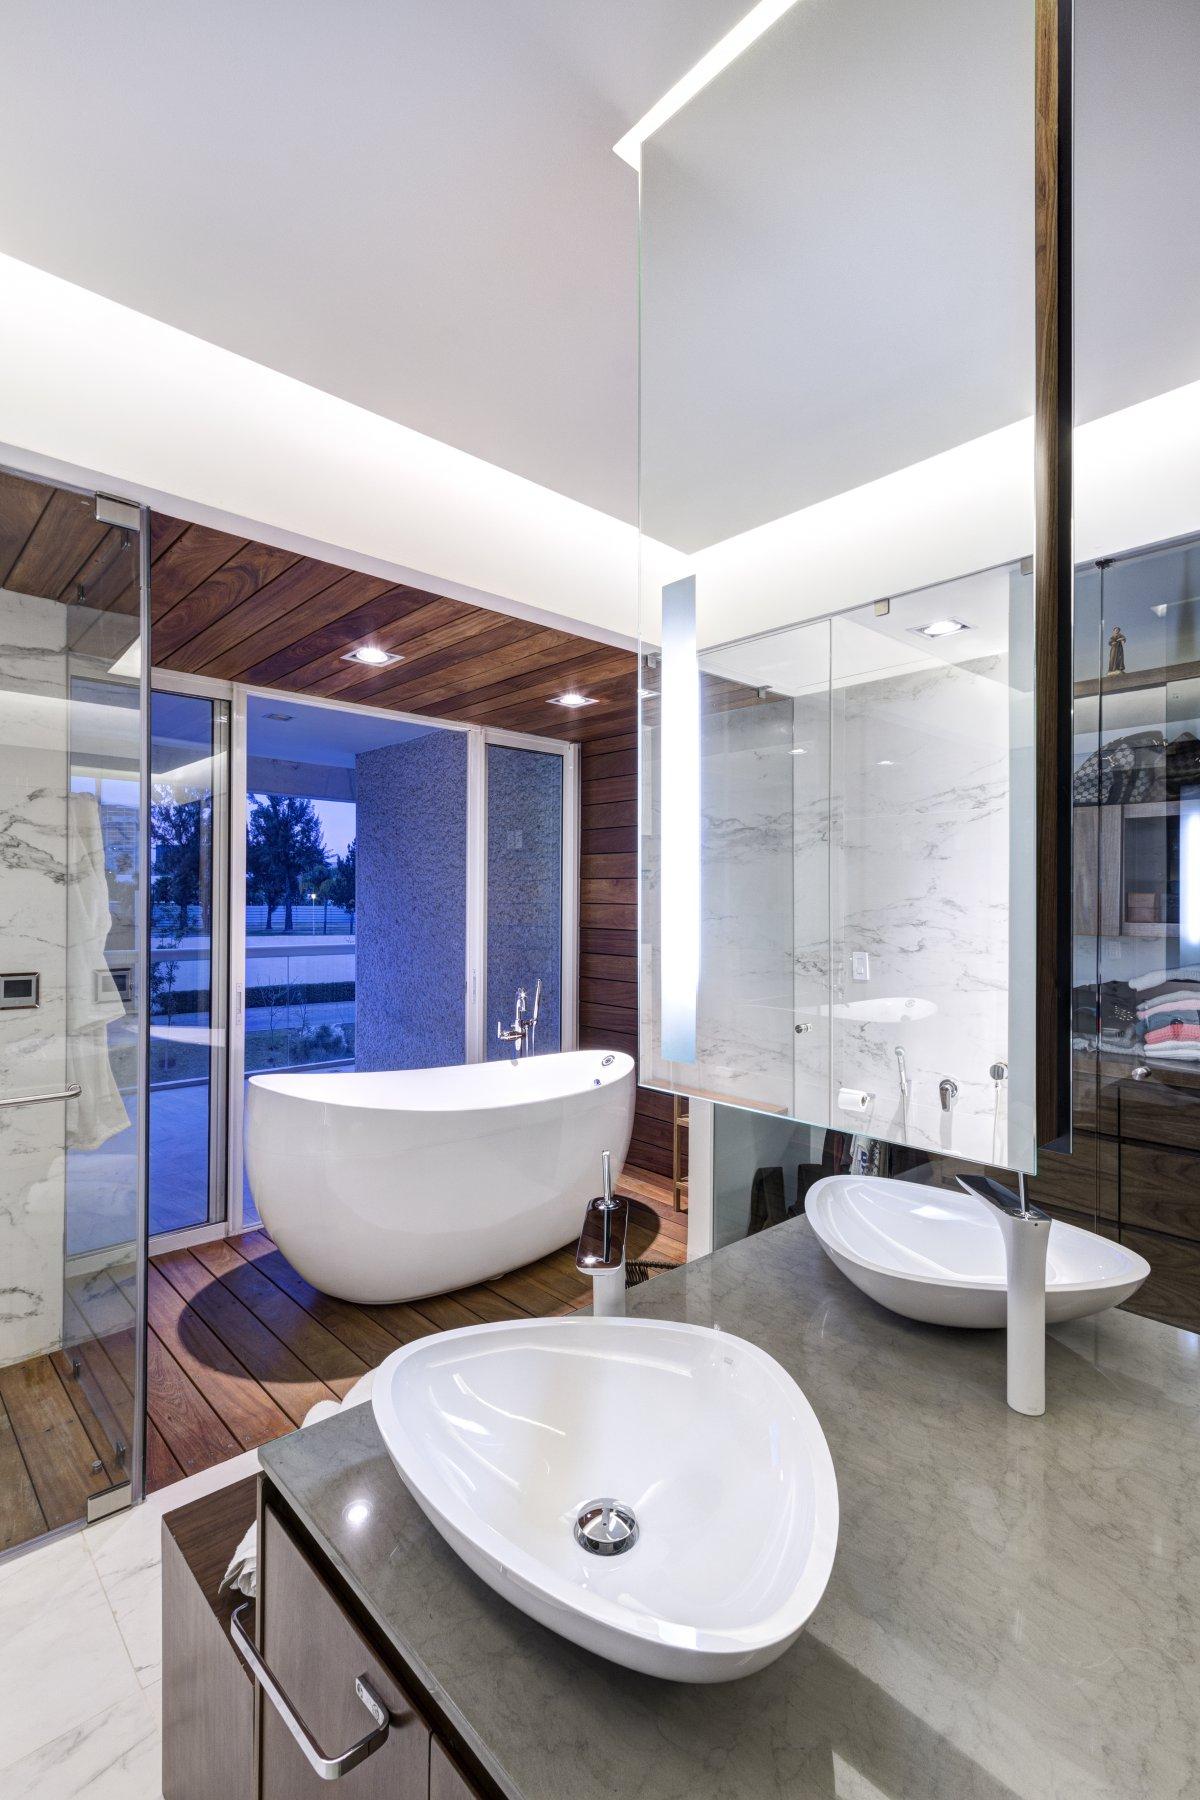 lassala orozco casa lr302 bañera exenta espejo al aire